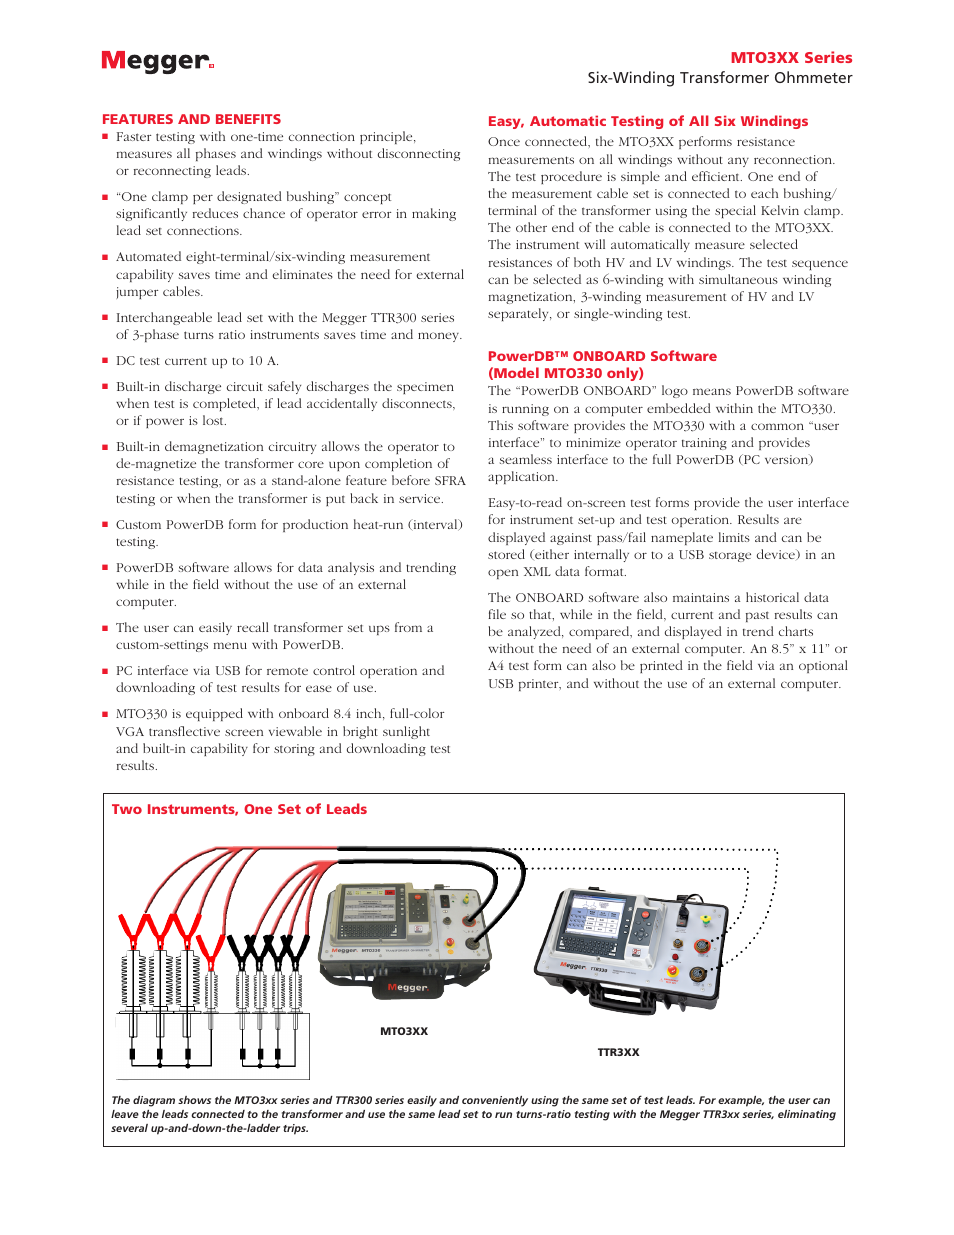 Atec Megger-MTO3XX Series User Manual | Page 2 / 3